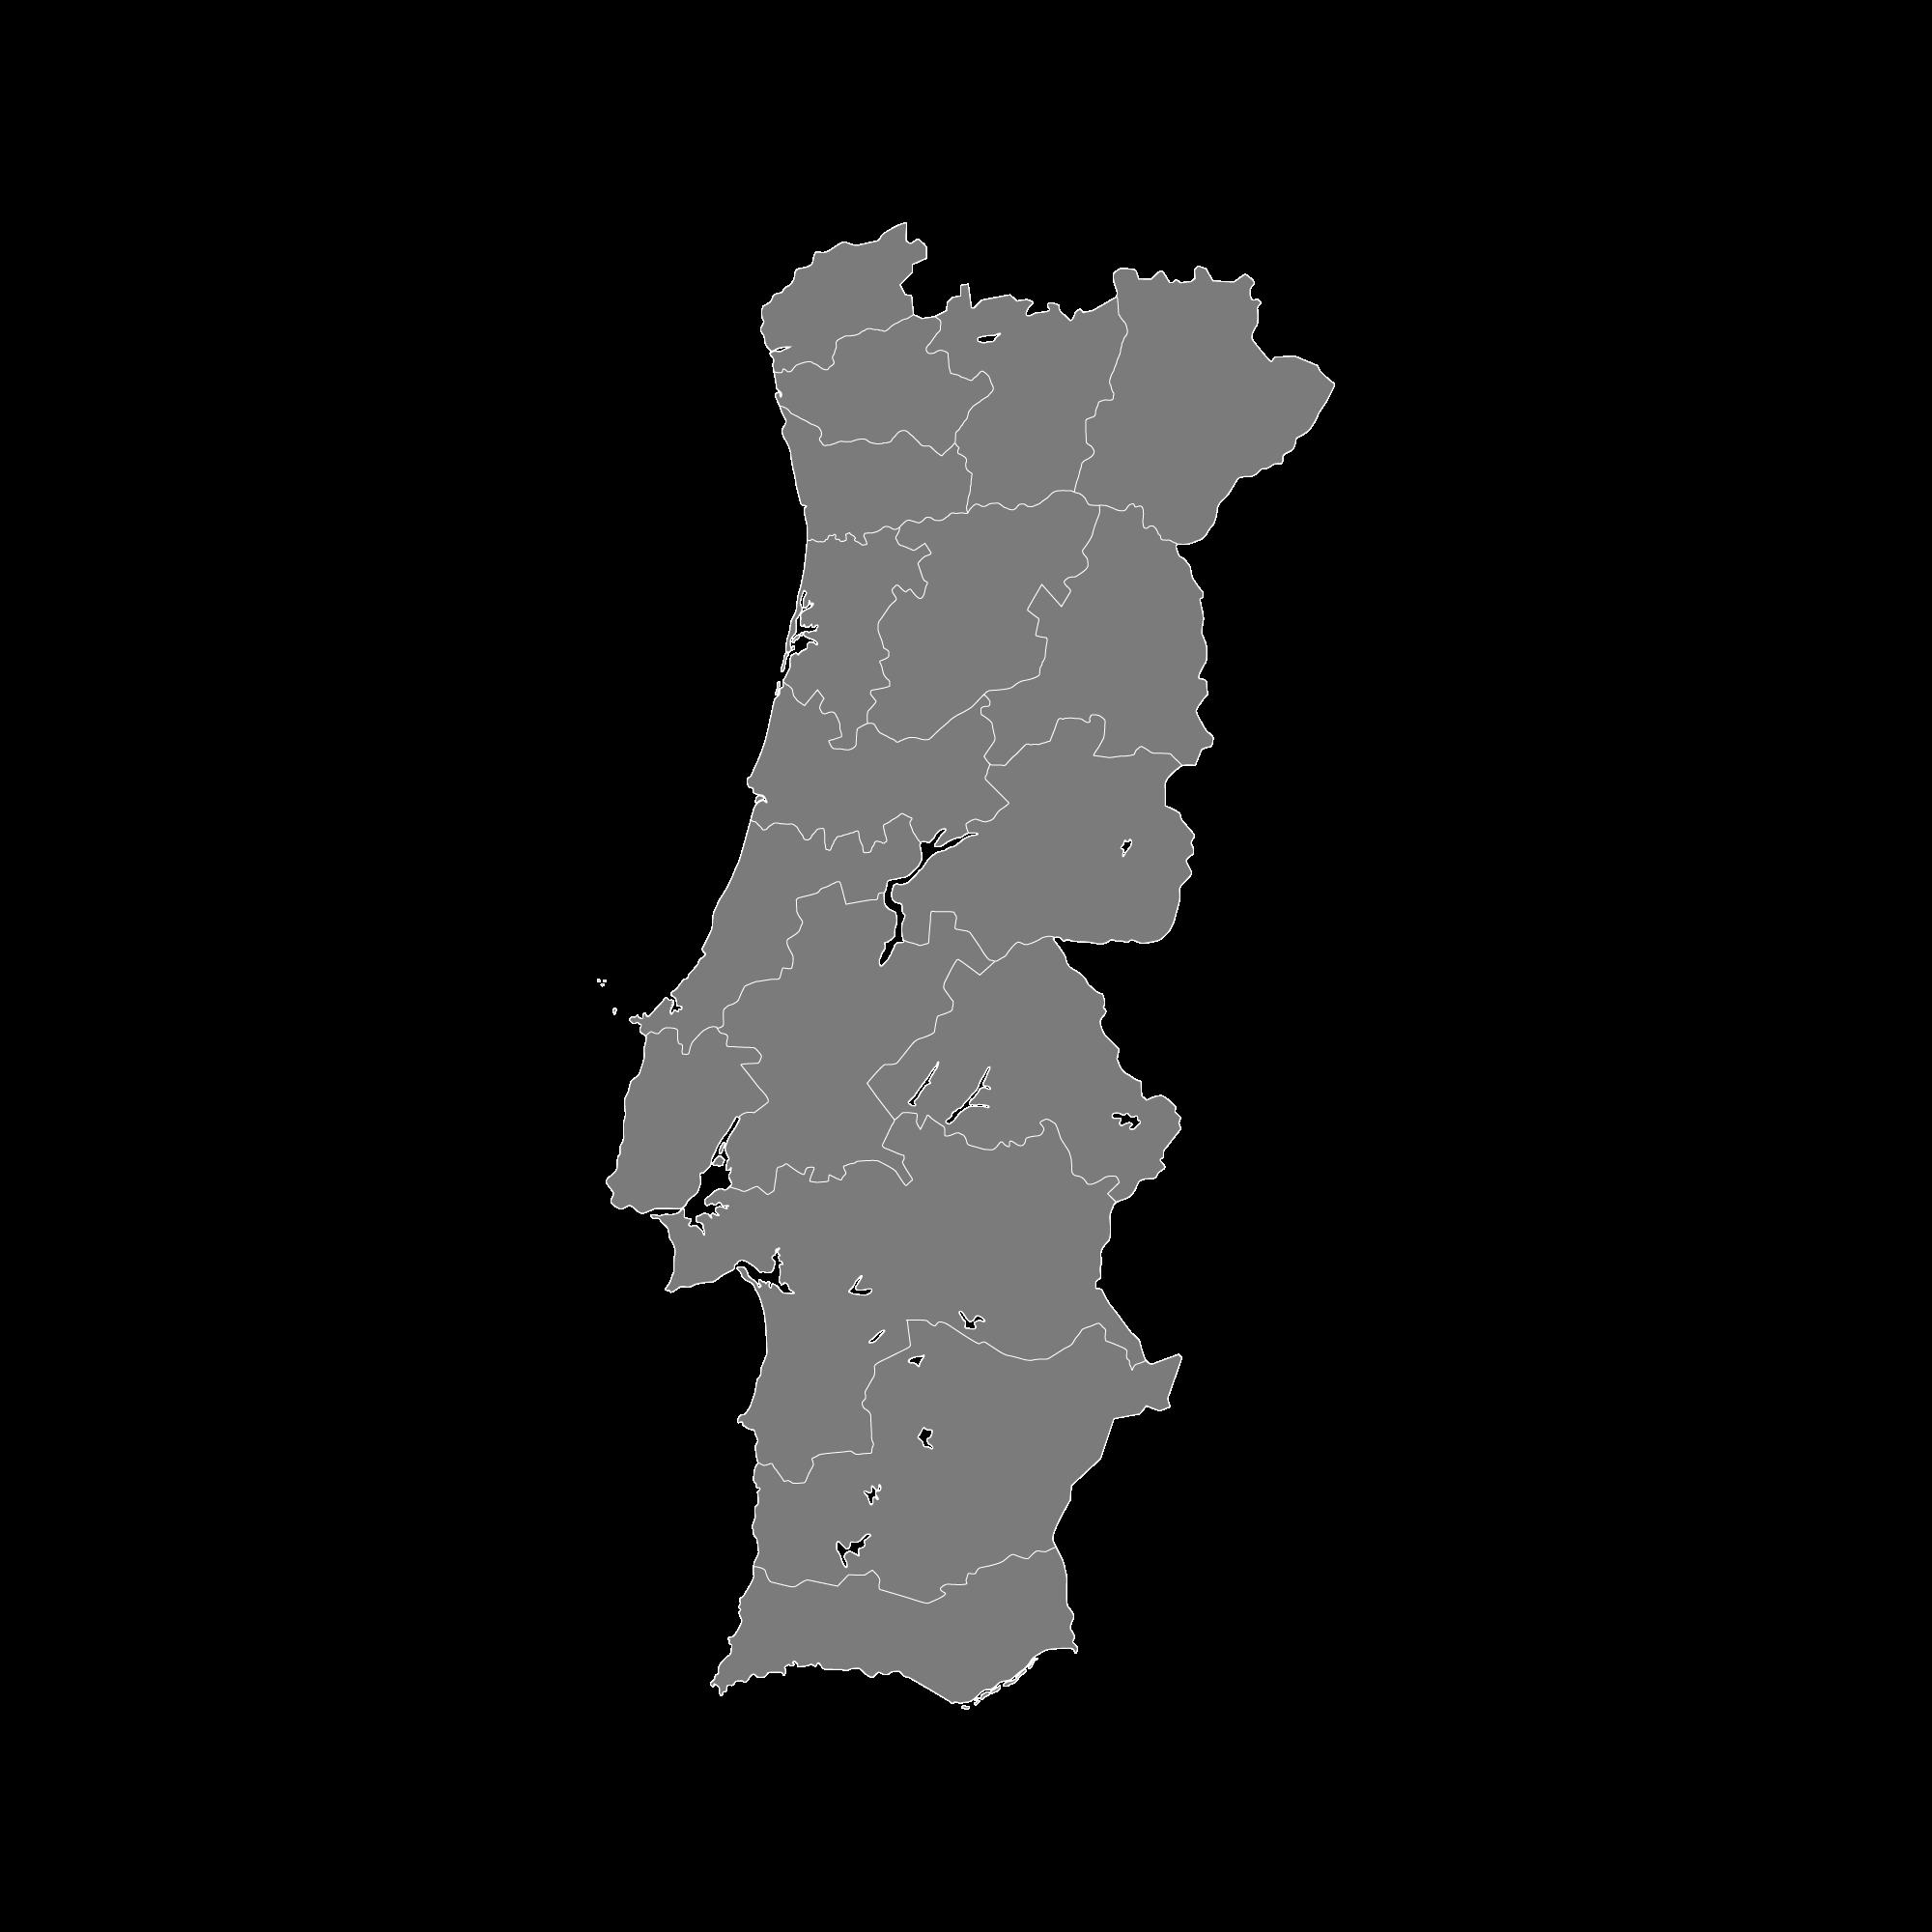 Portugal, país donde realizamos envíos